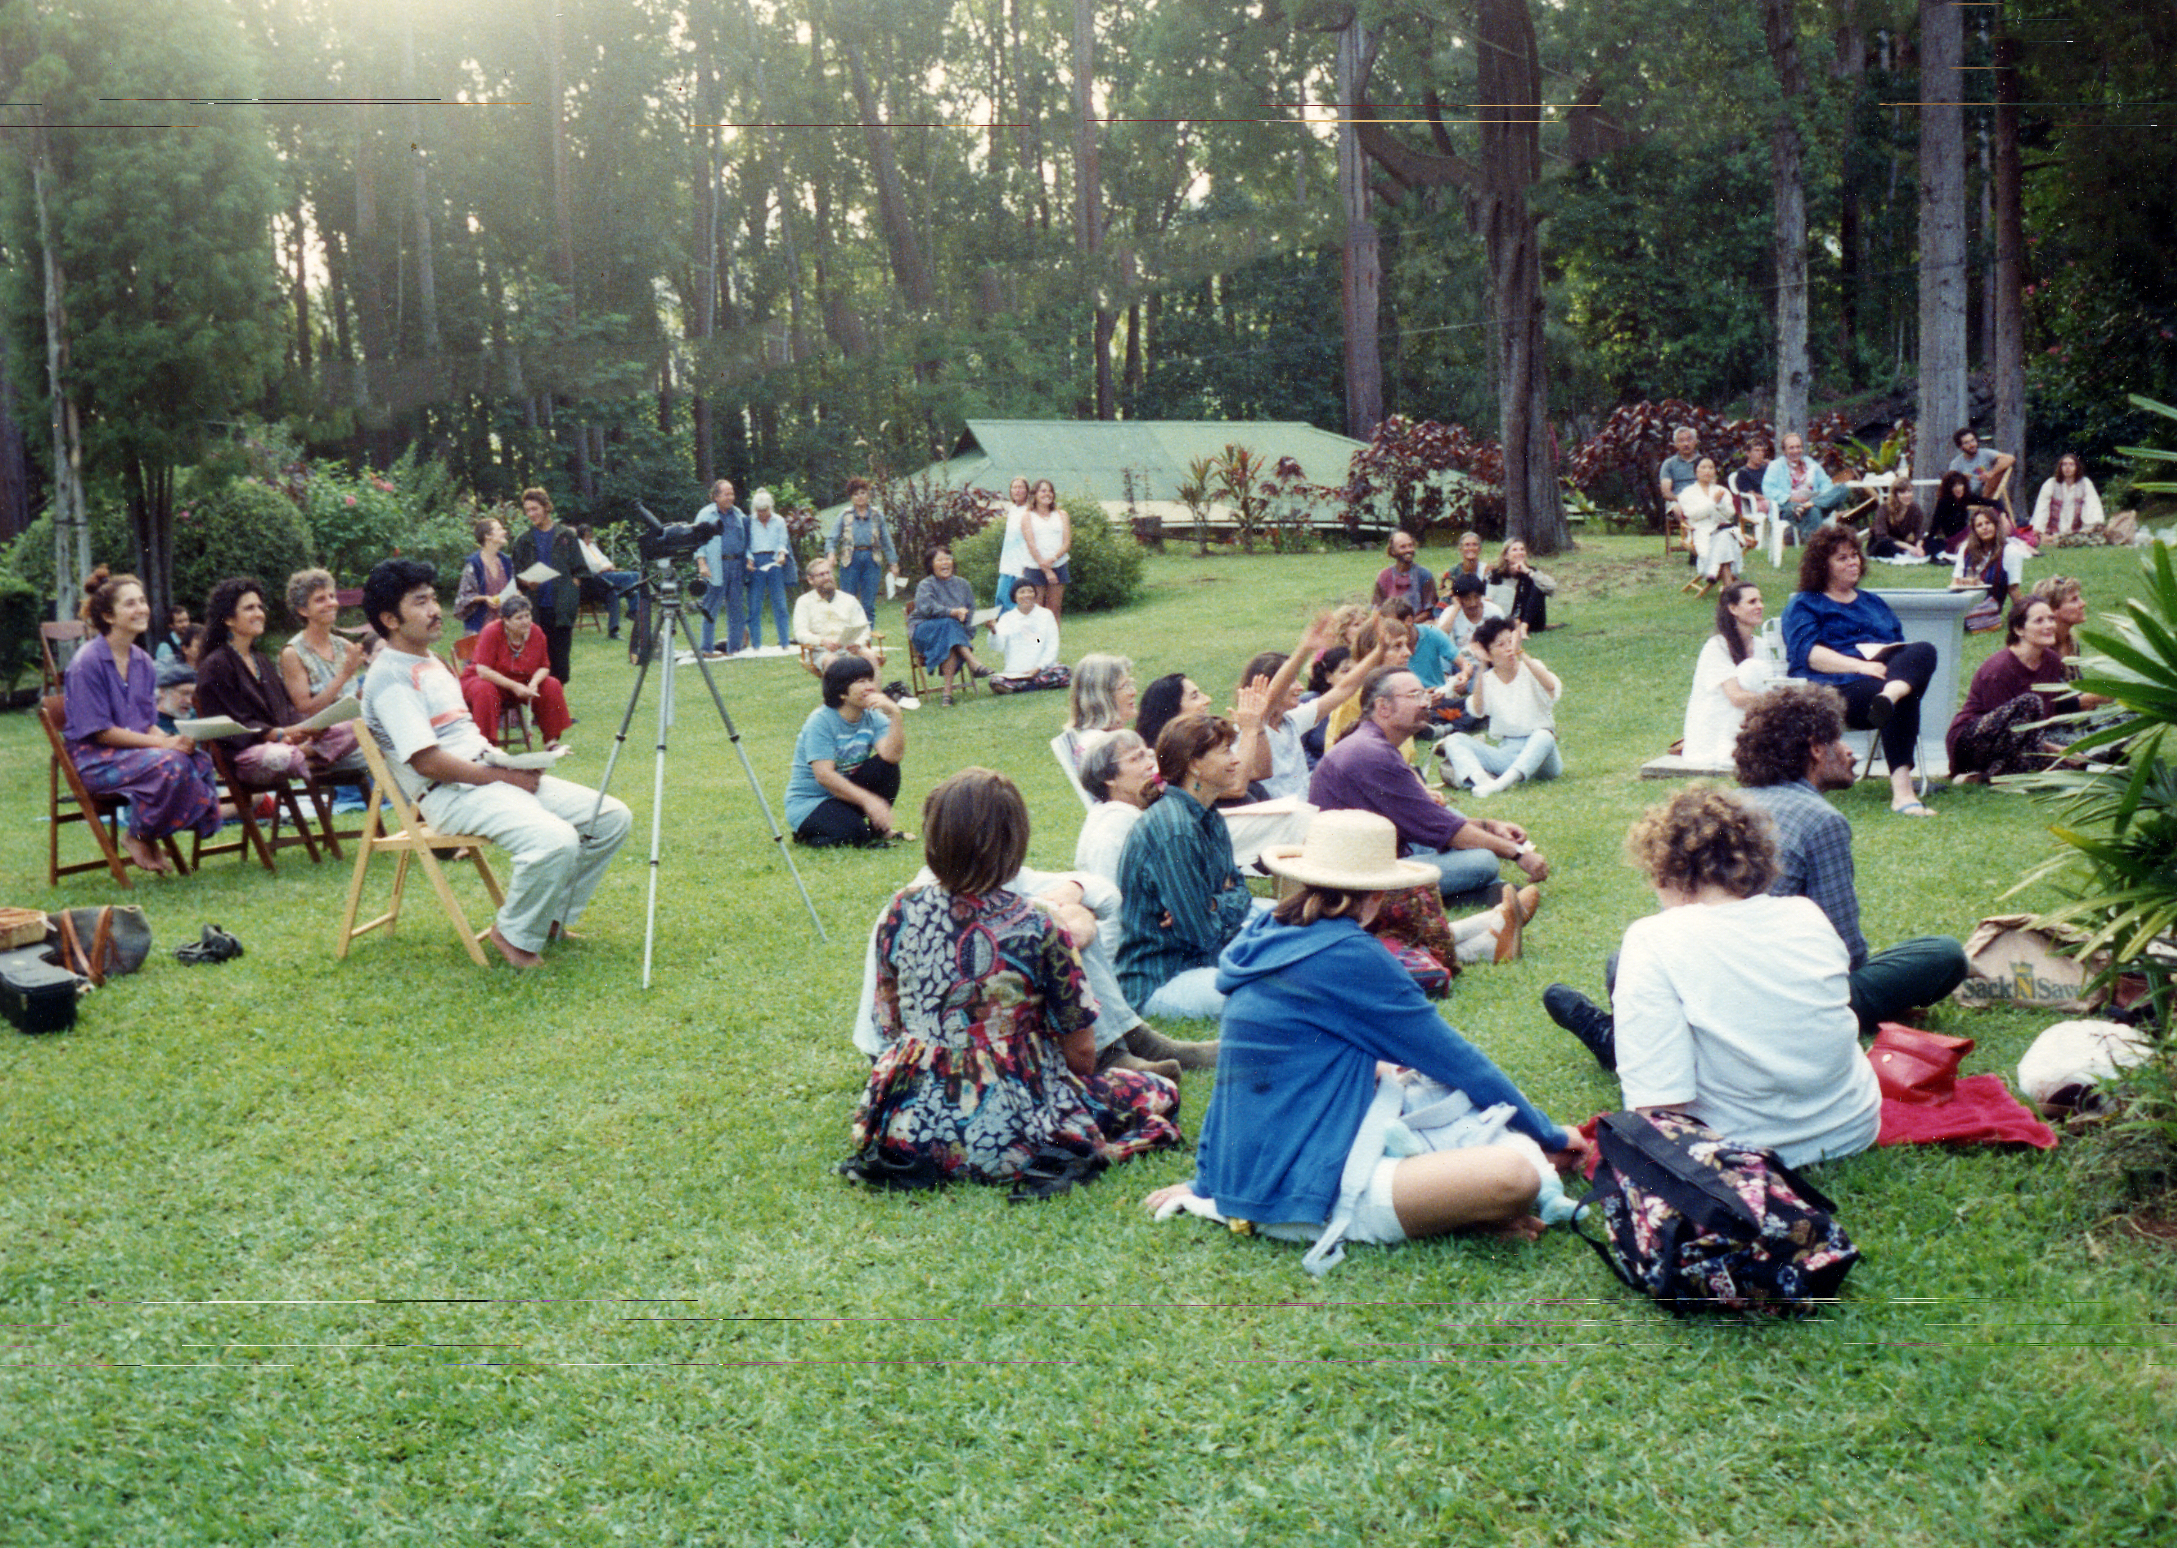 Gathering on grass.jpg